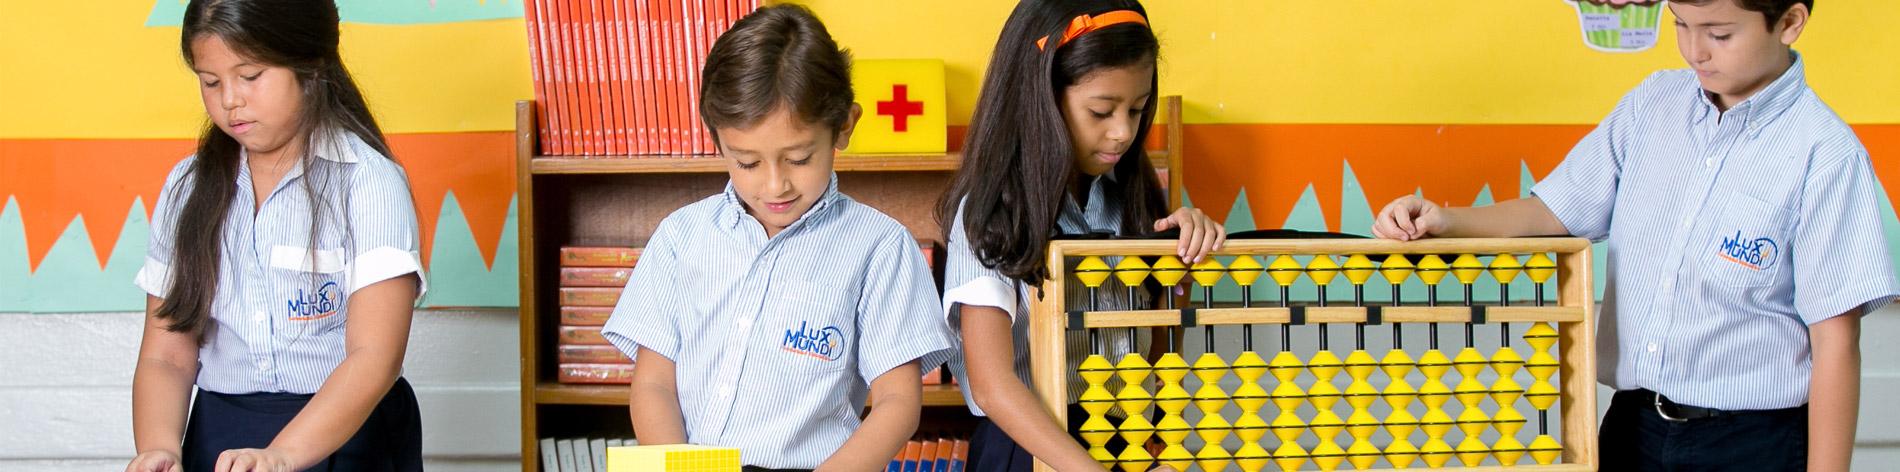 Propuesta Educativa LuxMundi